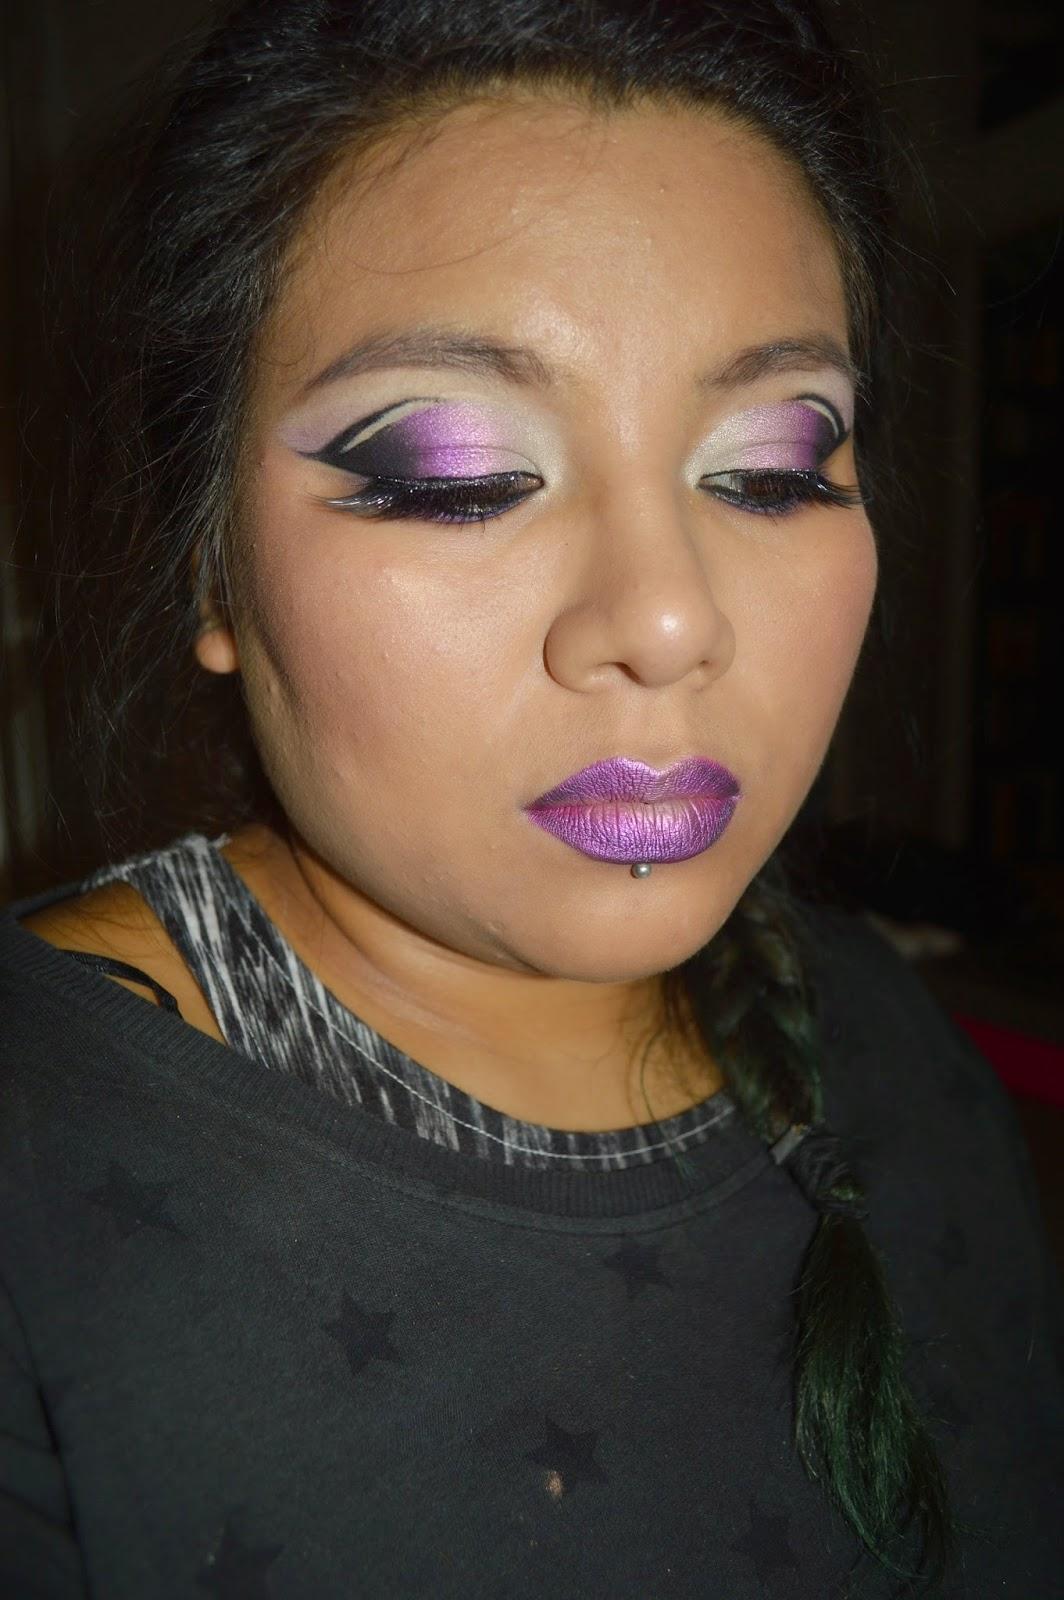 Nabla, Cattleya, Madreperla, Hot SMoked, Makeup Revolution, Cherry Diamond Lips, Kiko, Neve Cosmetics, Mua, Earth&Heaven, Essence